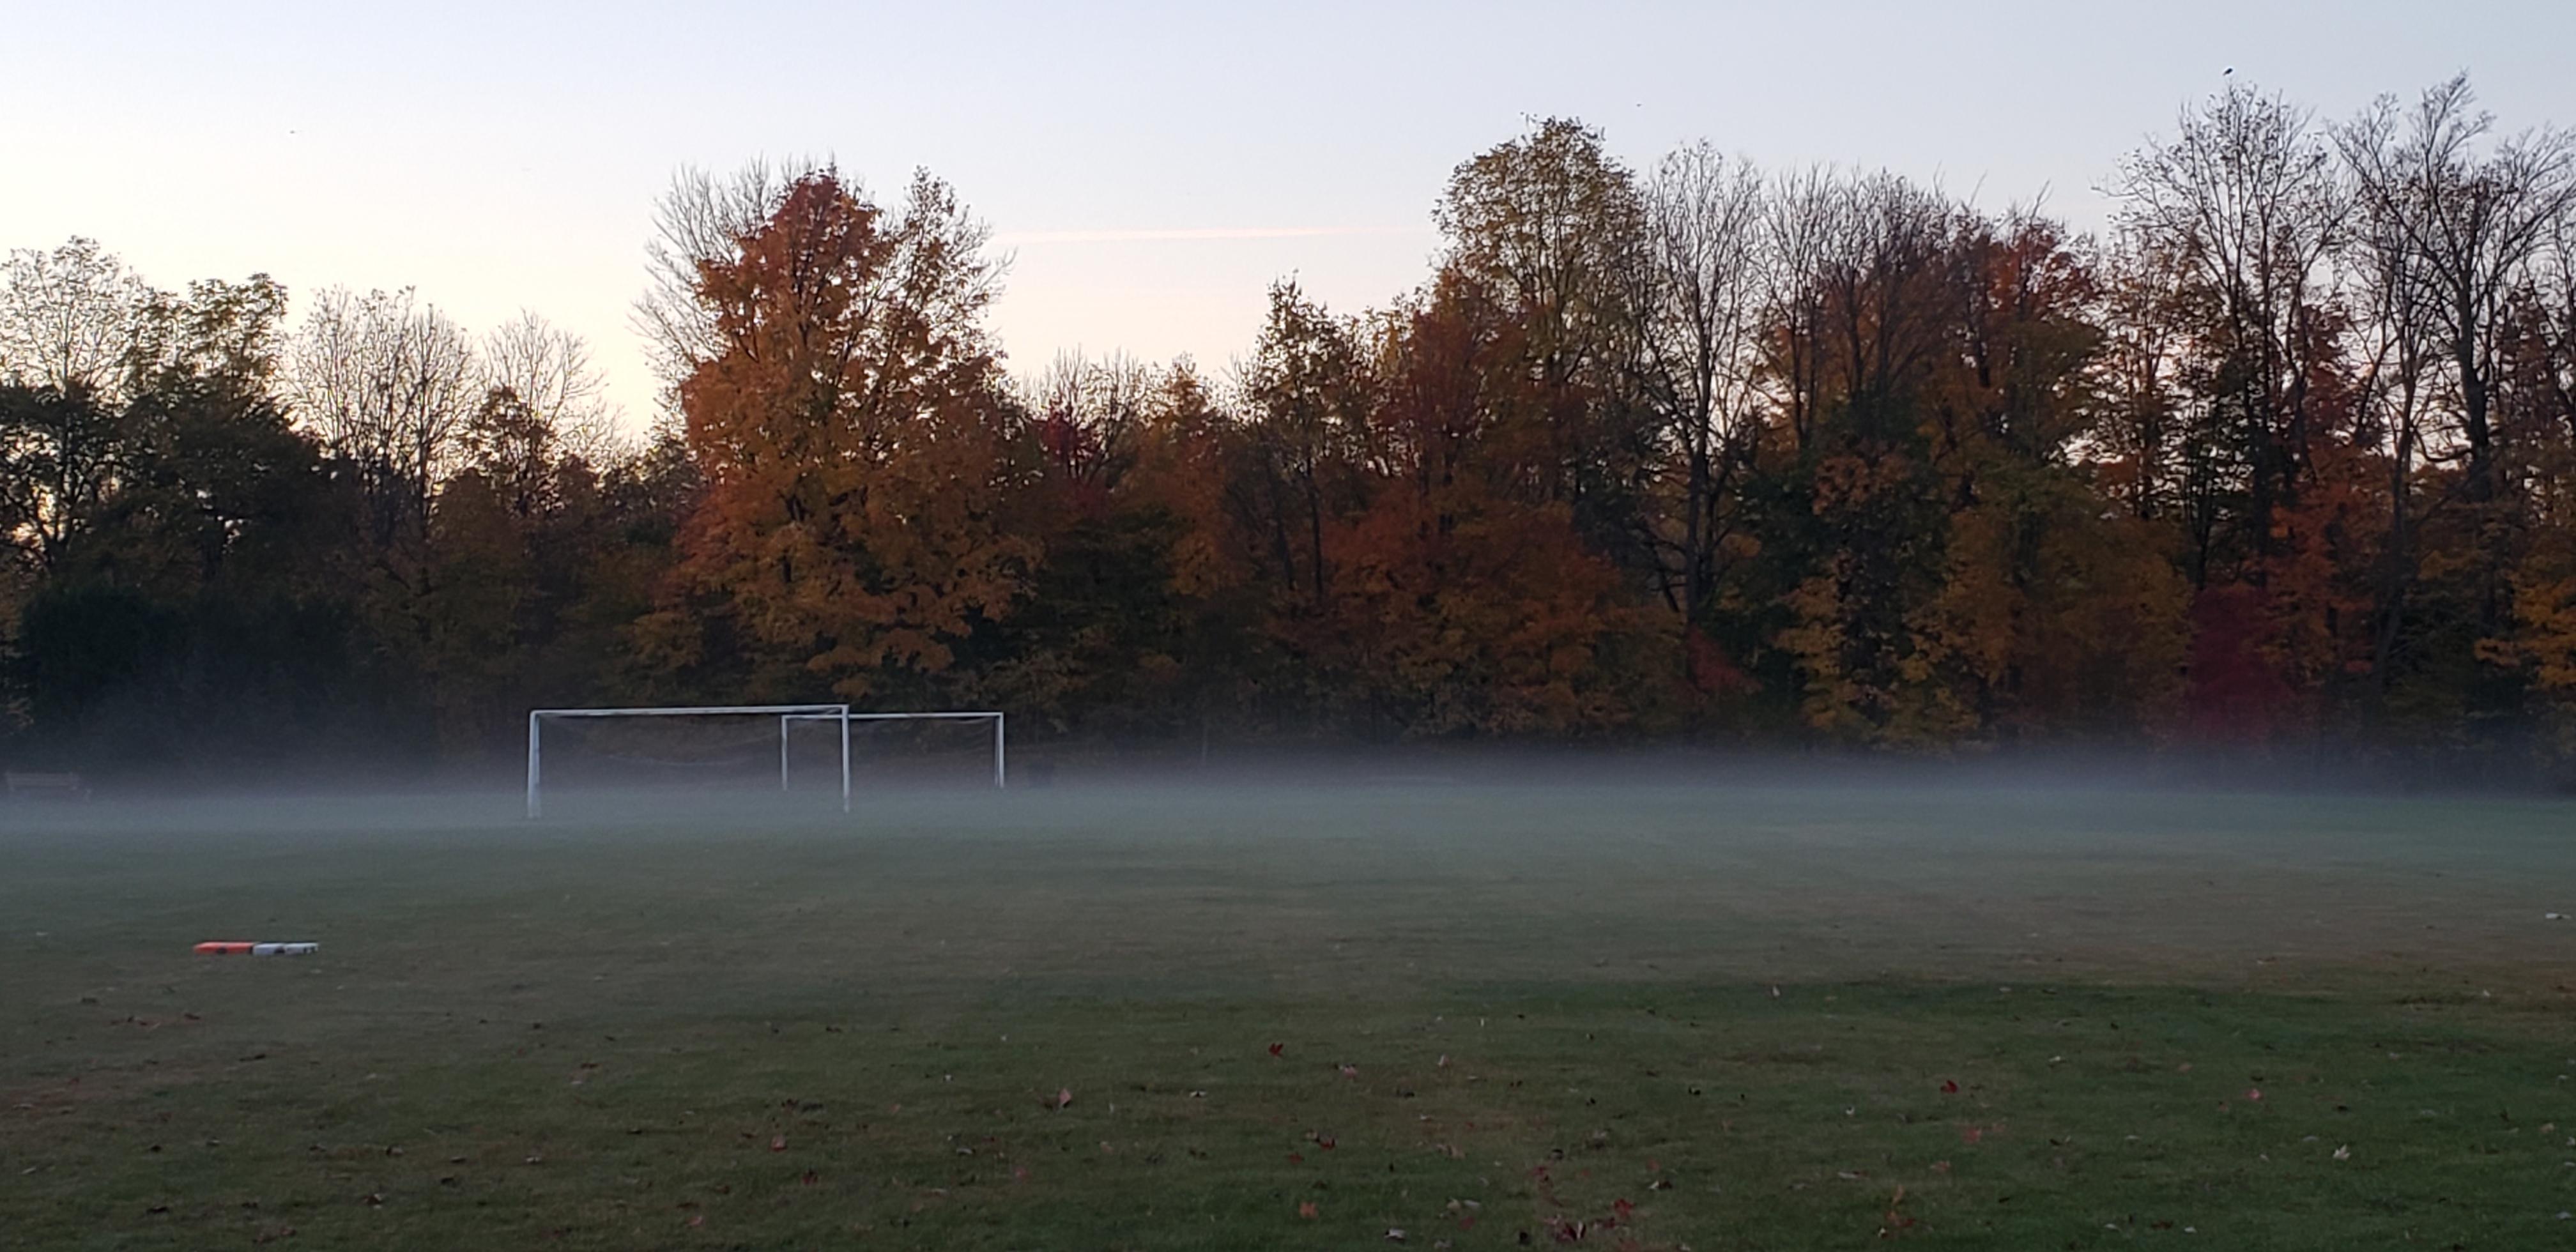 Misty Playing Field